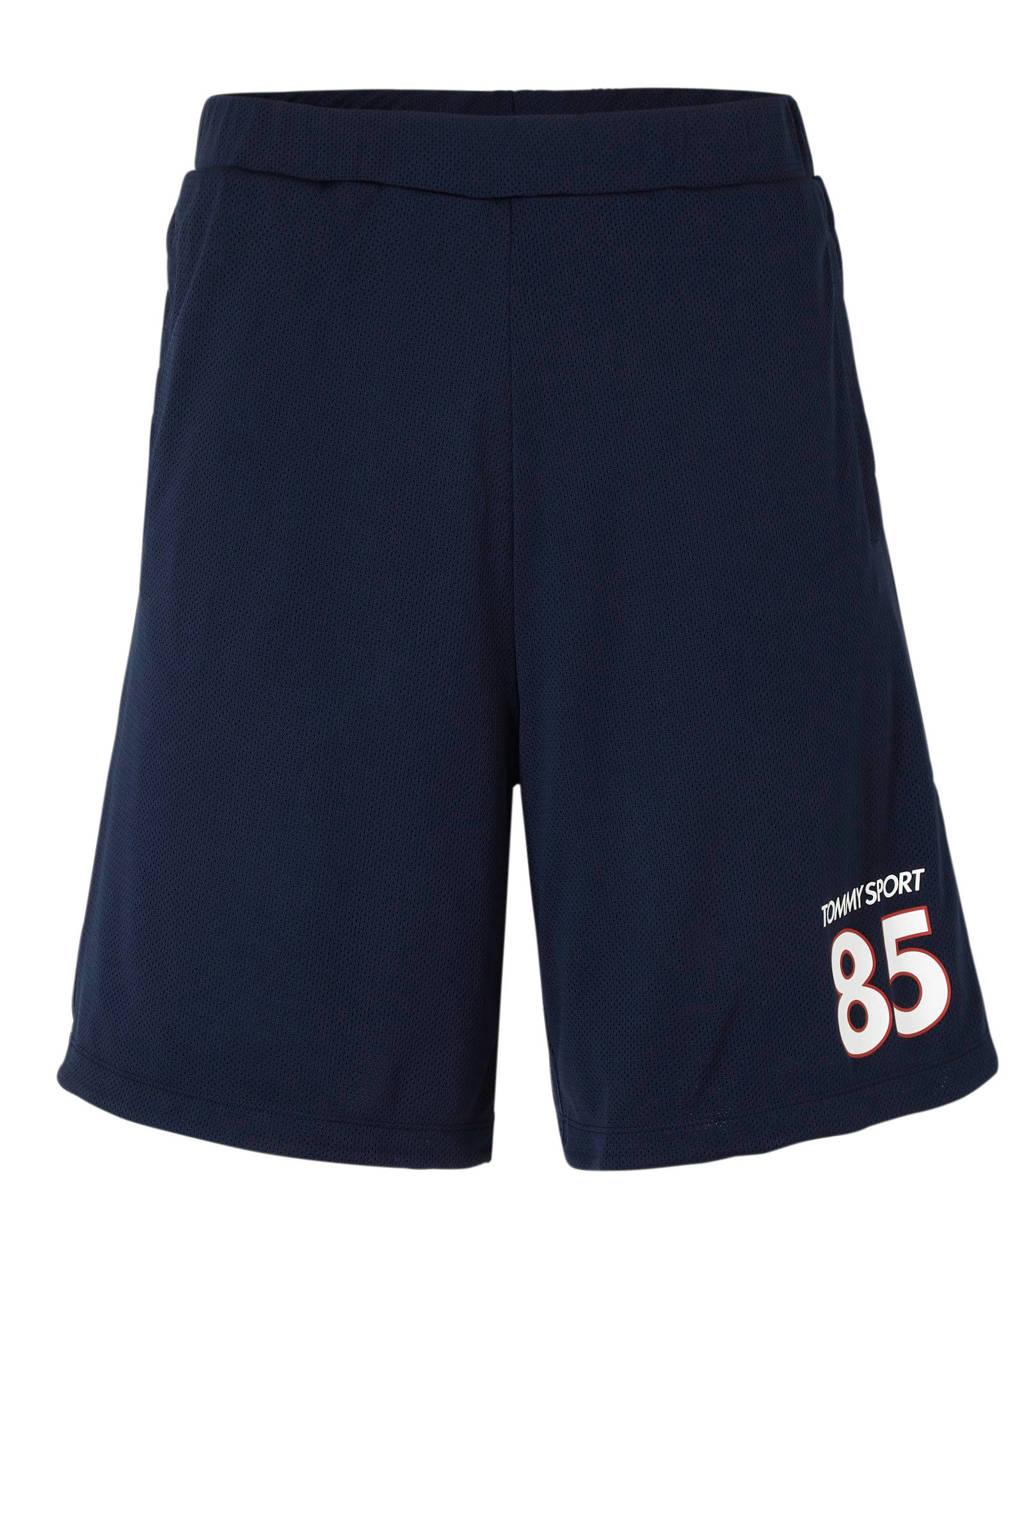 Tommy Sport   sportshort met printopdruk donkerblauw, Donkerblauw